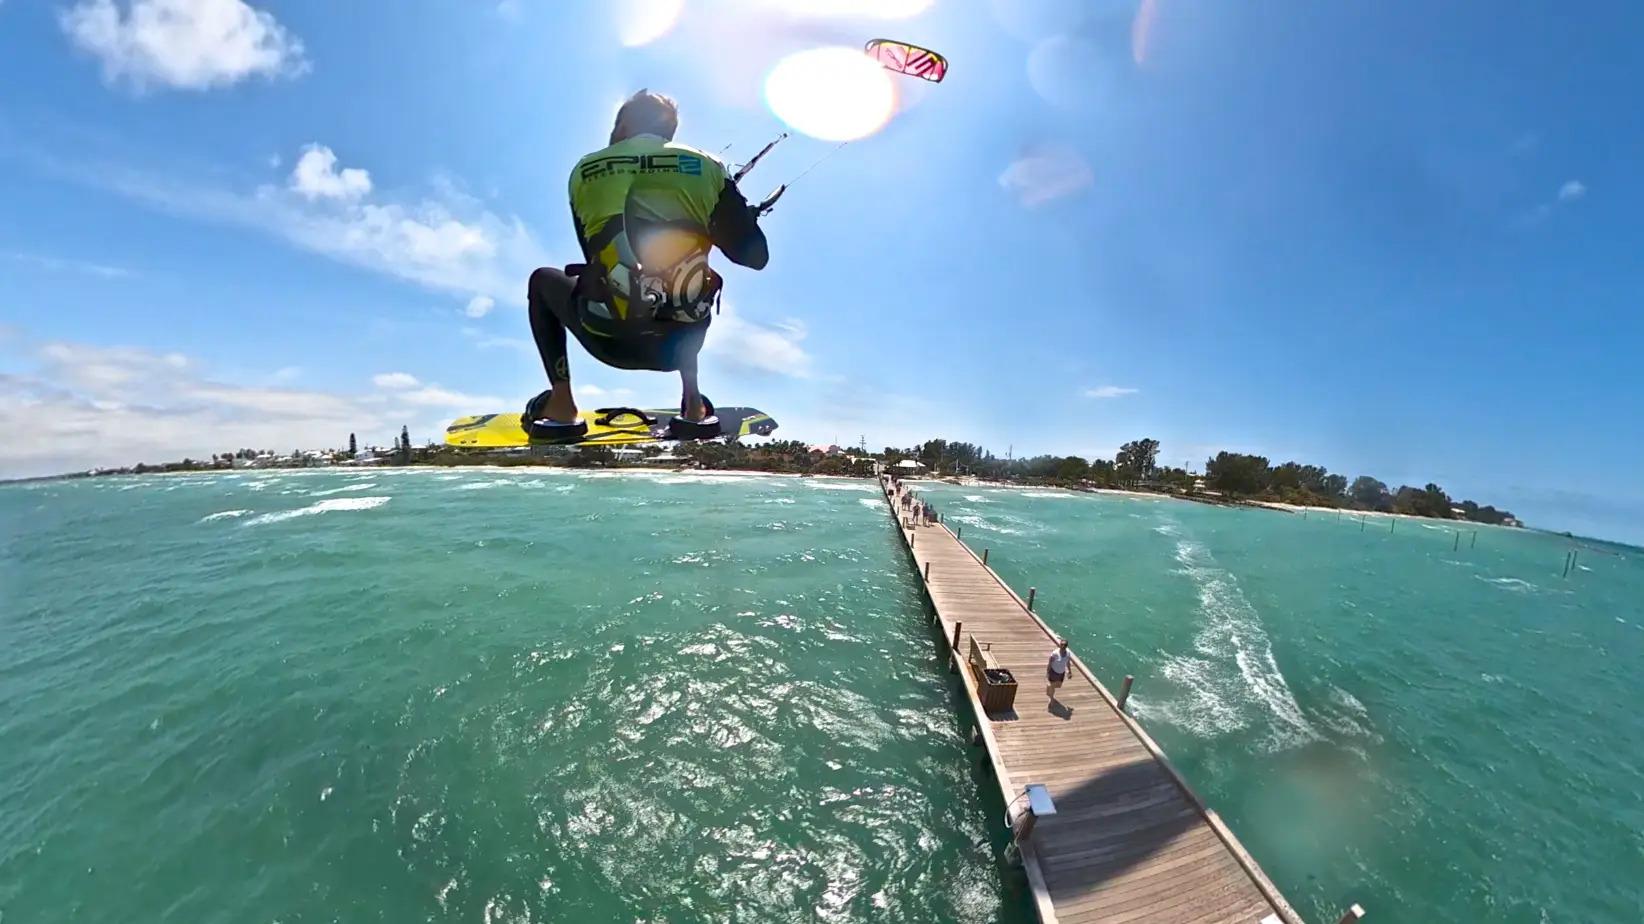 Jumping the Anna Maria pier Florida - with Epic Kites Kiteboarding